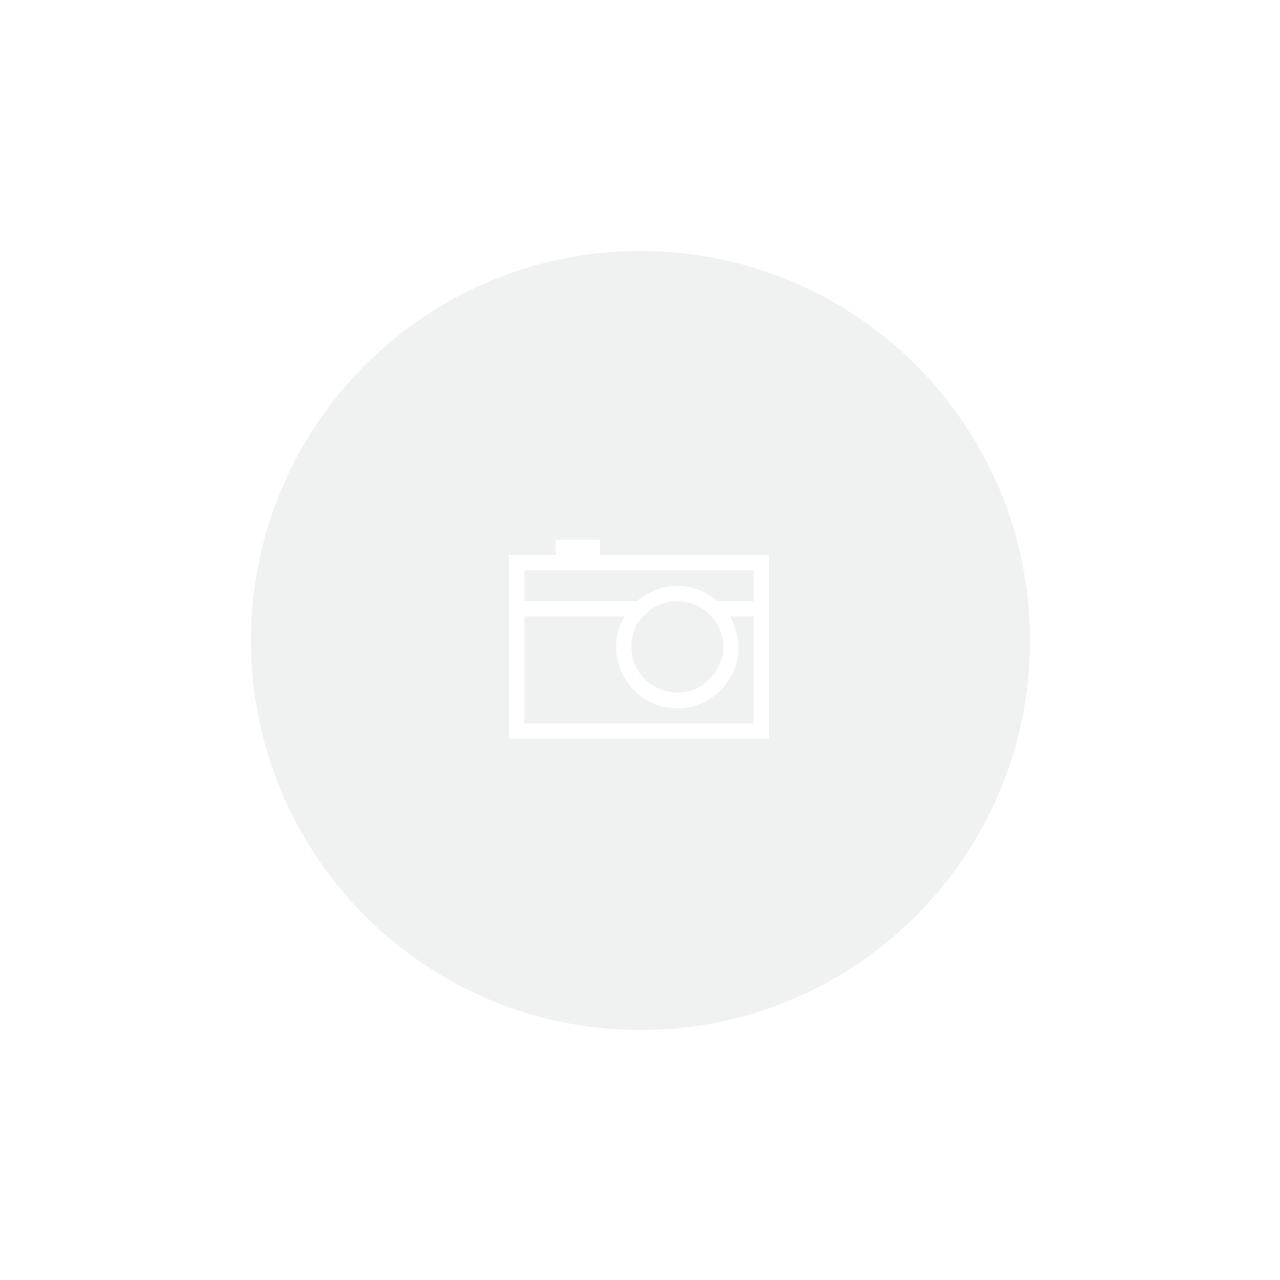 Panela Inox 20Cm 2,90 Litros Profissional Tramontina